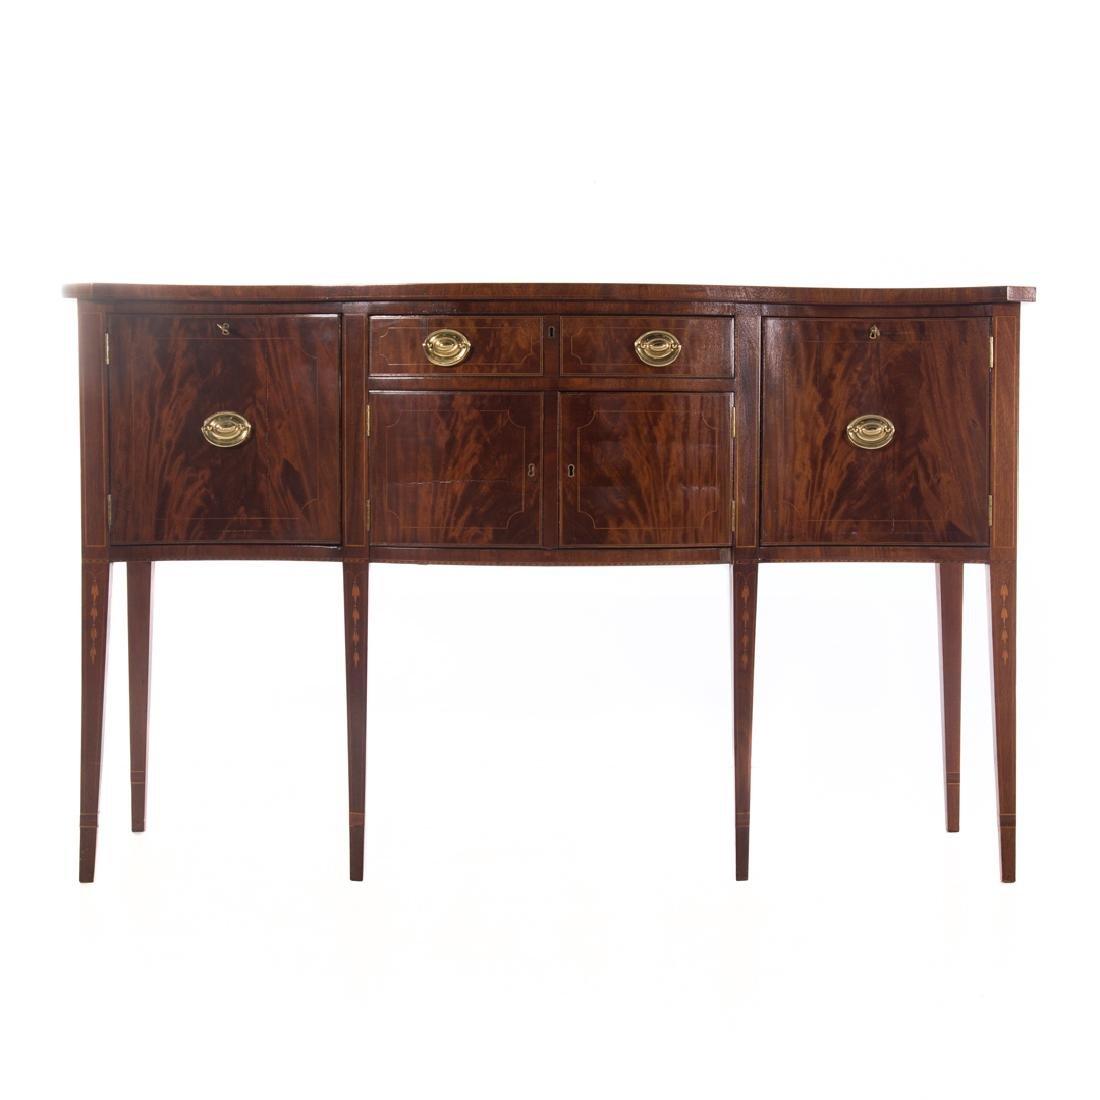 Centennial Federal style inlaid mahogany sideboard